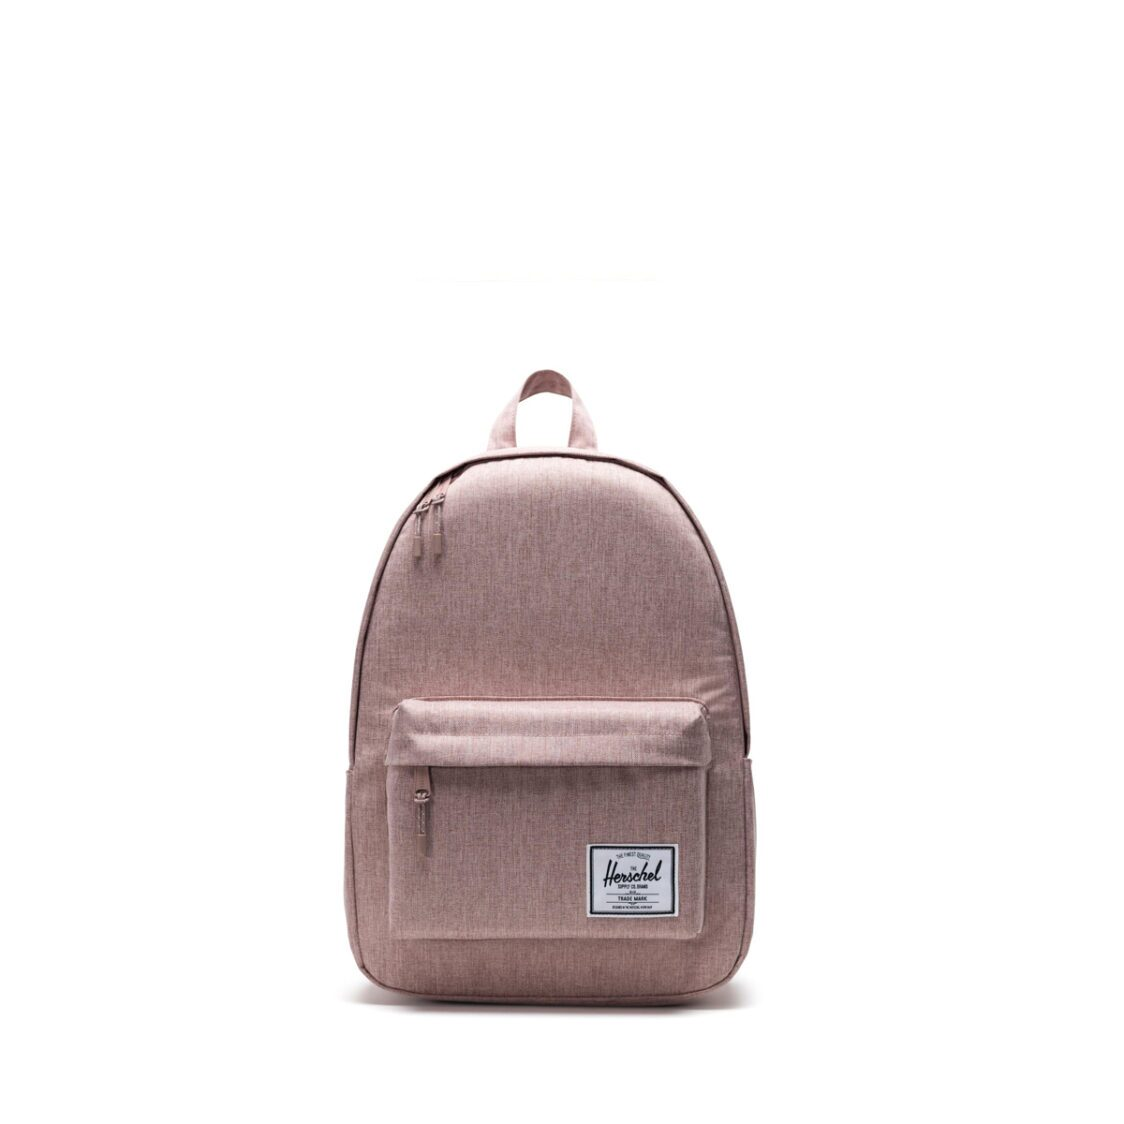 Herschel Classic X-Large Ash Rose Crosshatch Backpack 10492-04885-OS